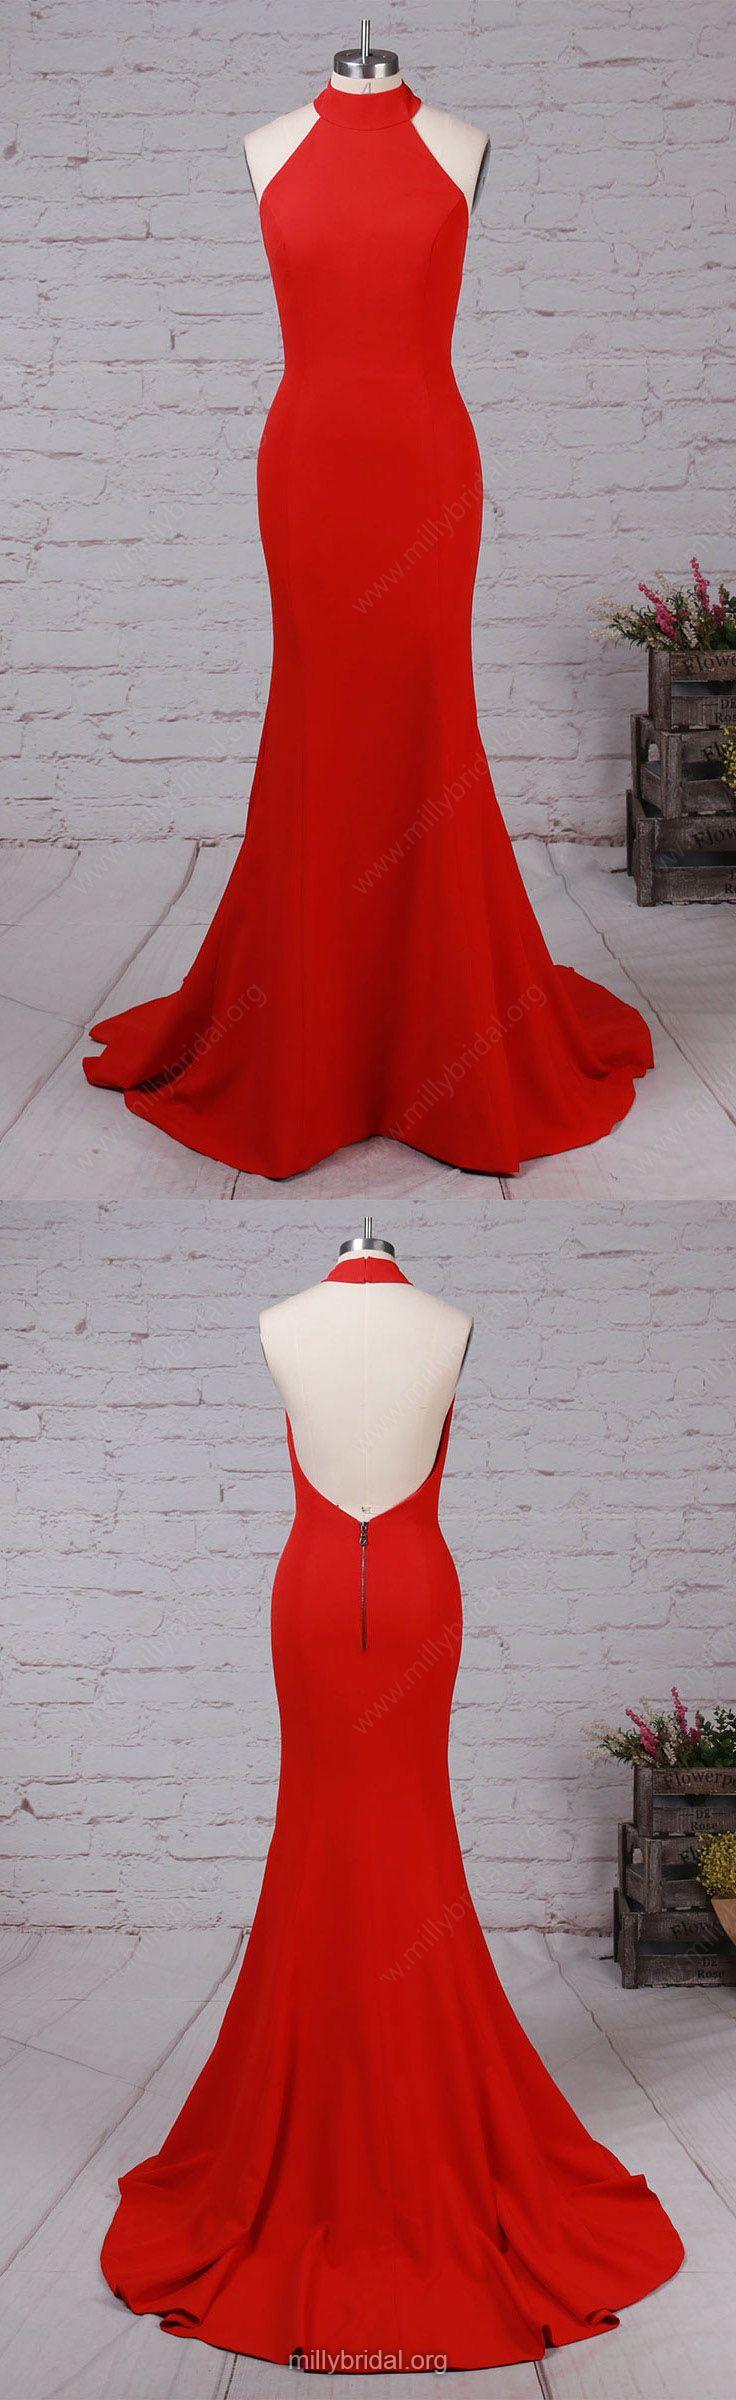 Long Prom Dresses,Red Prom Dresses,2018 Prom Dresses For Teens,Trumpet/Mermaid Prom Dresses Halter, Elastic Woven Satin Prom Dresses For Cheap